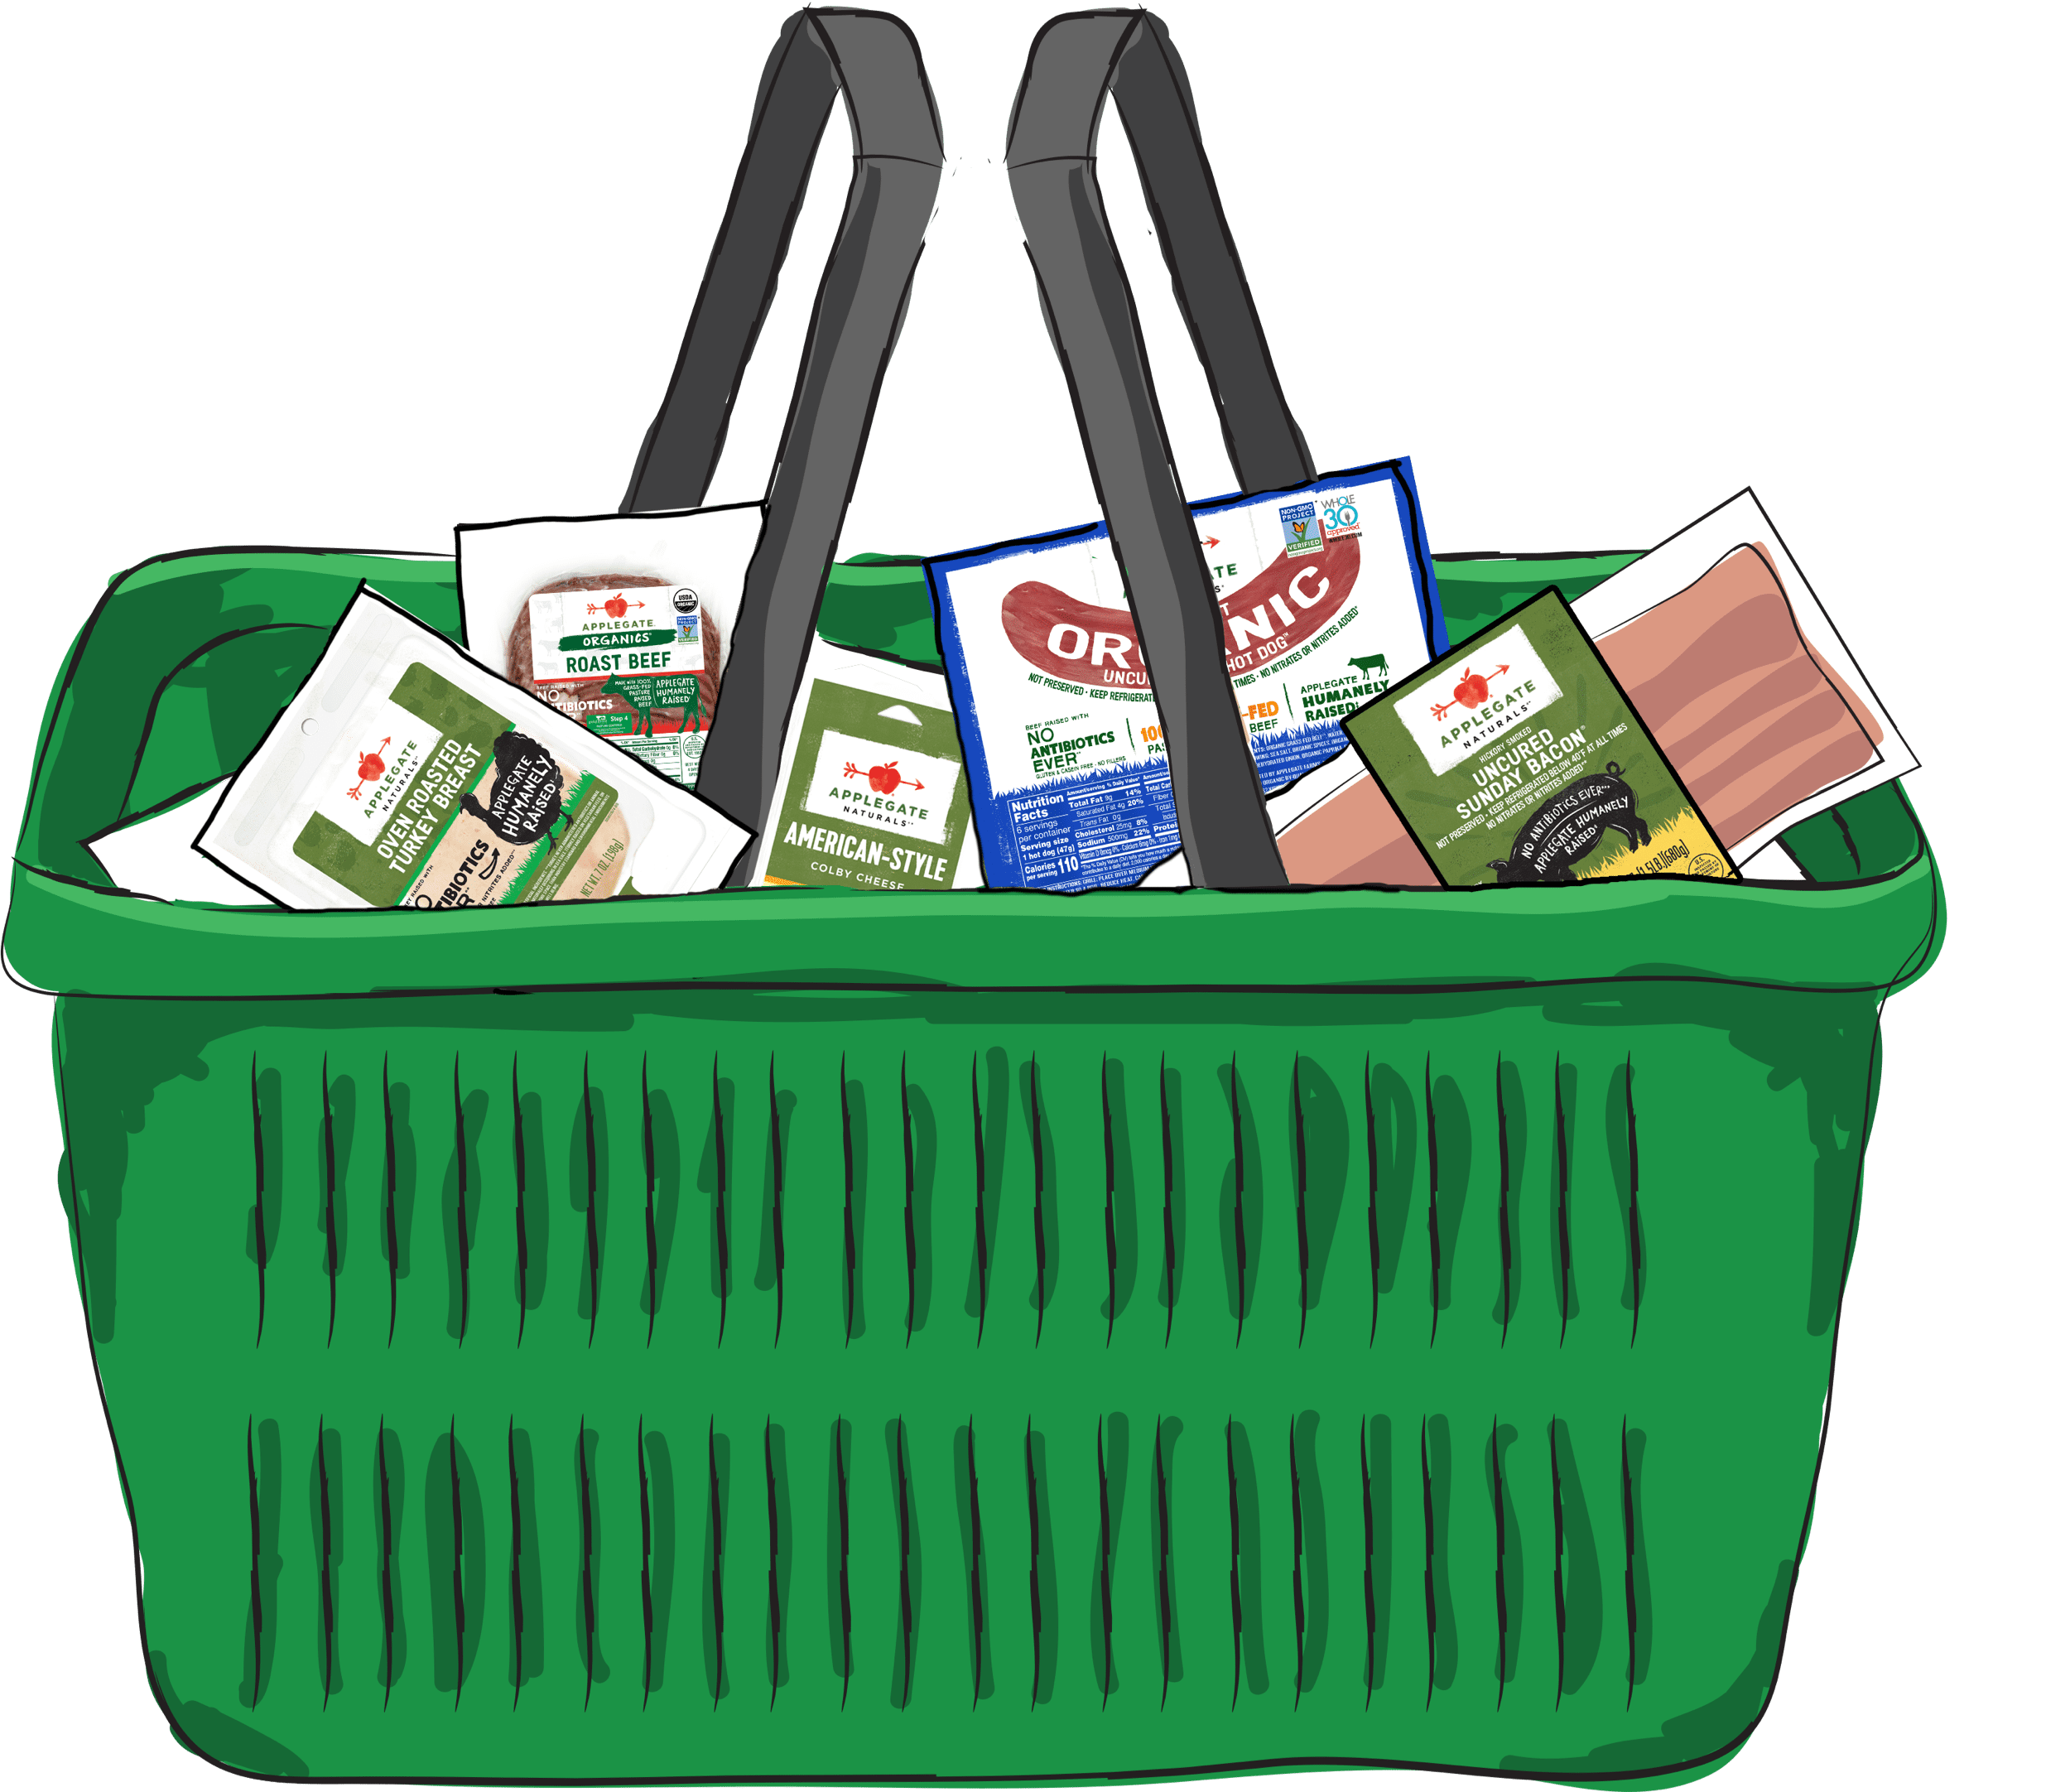 Products illustration